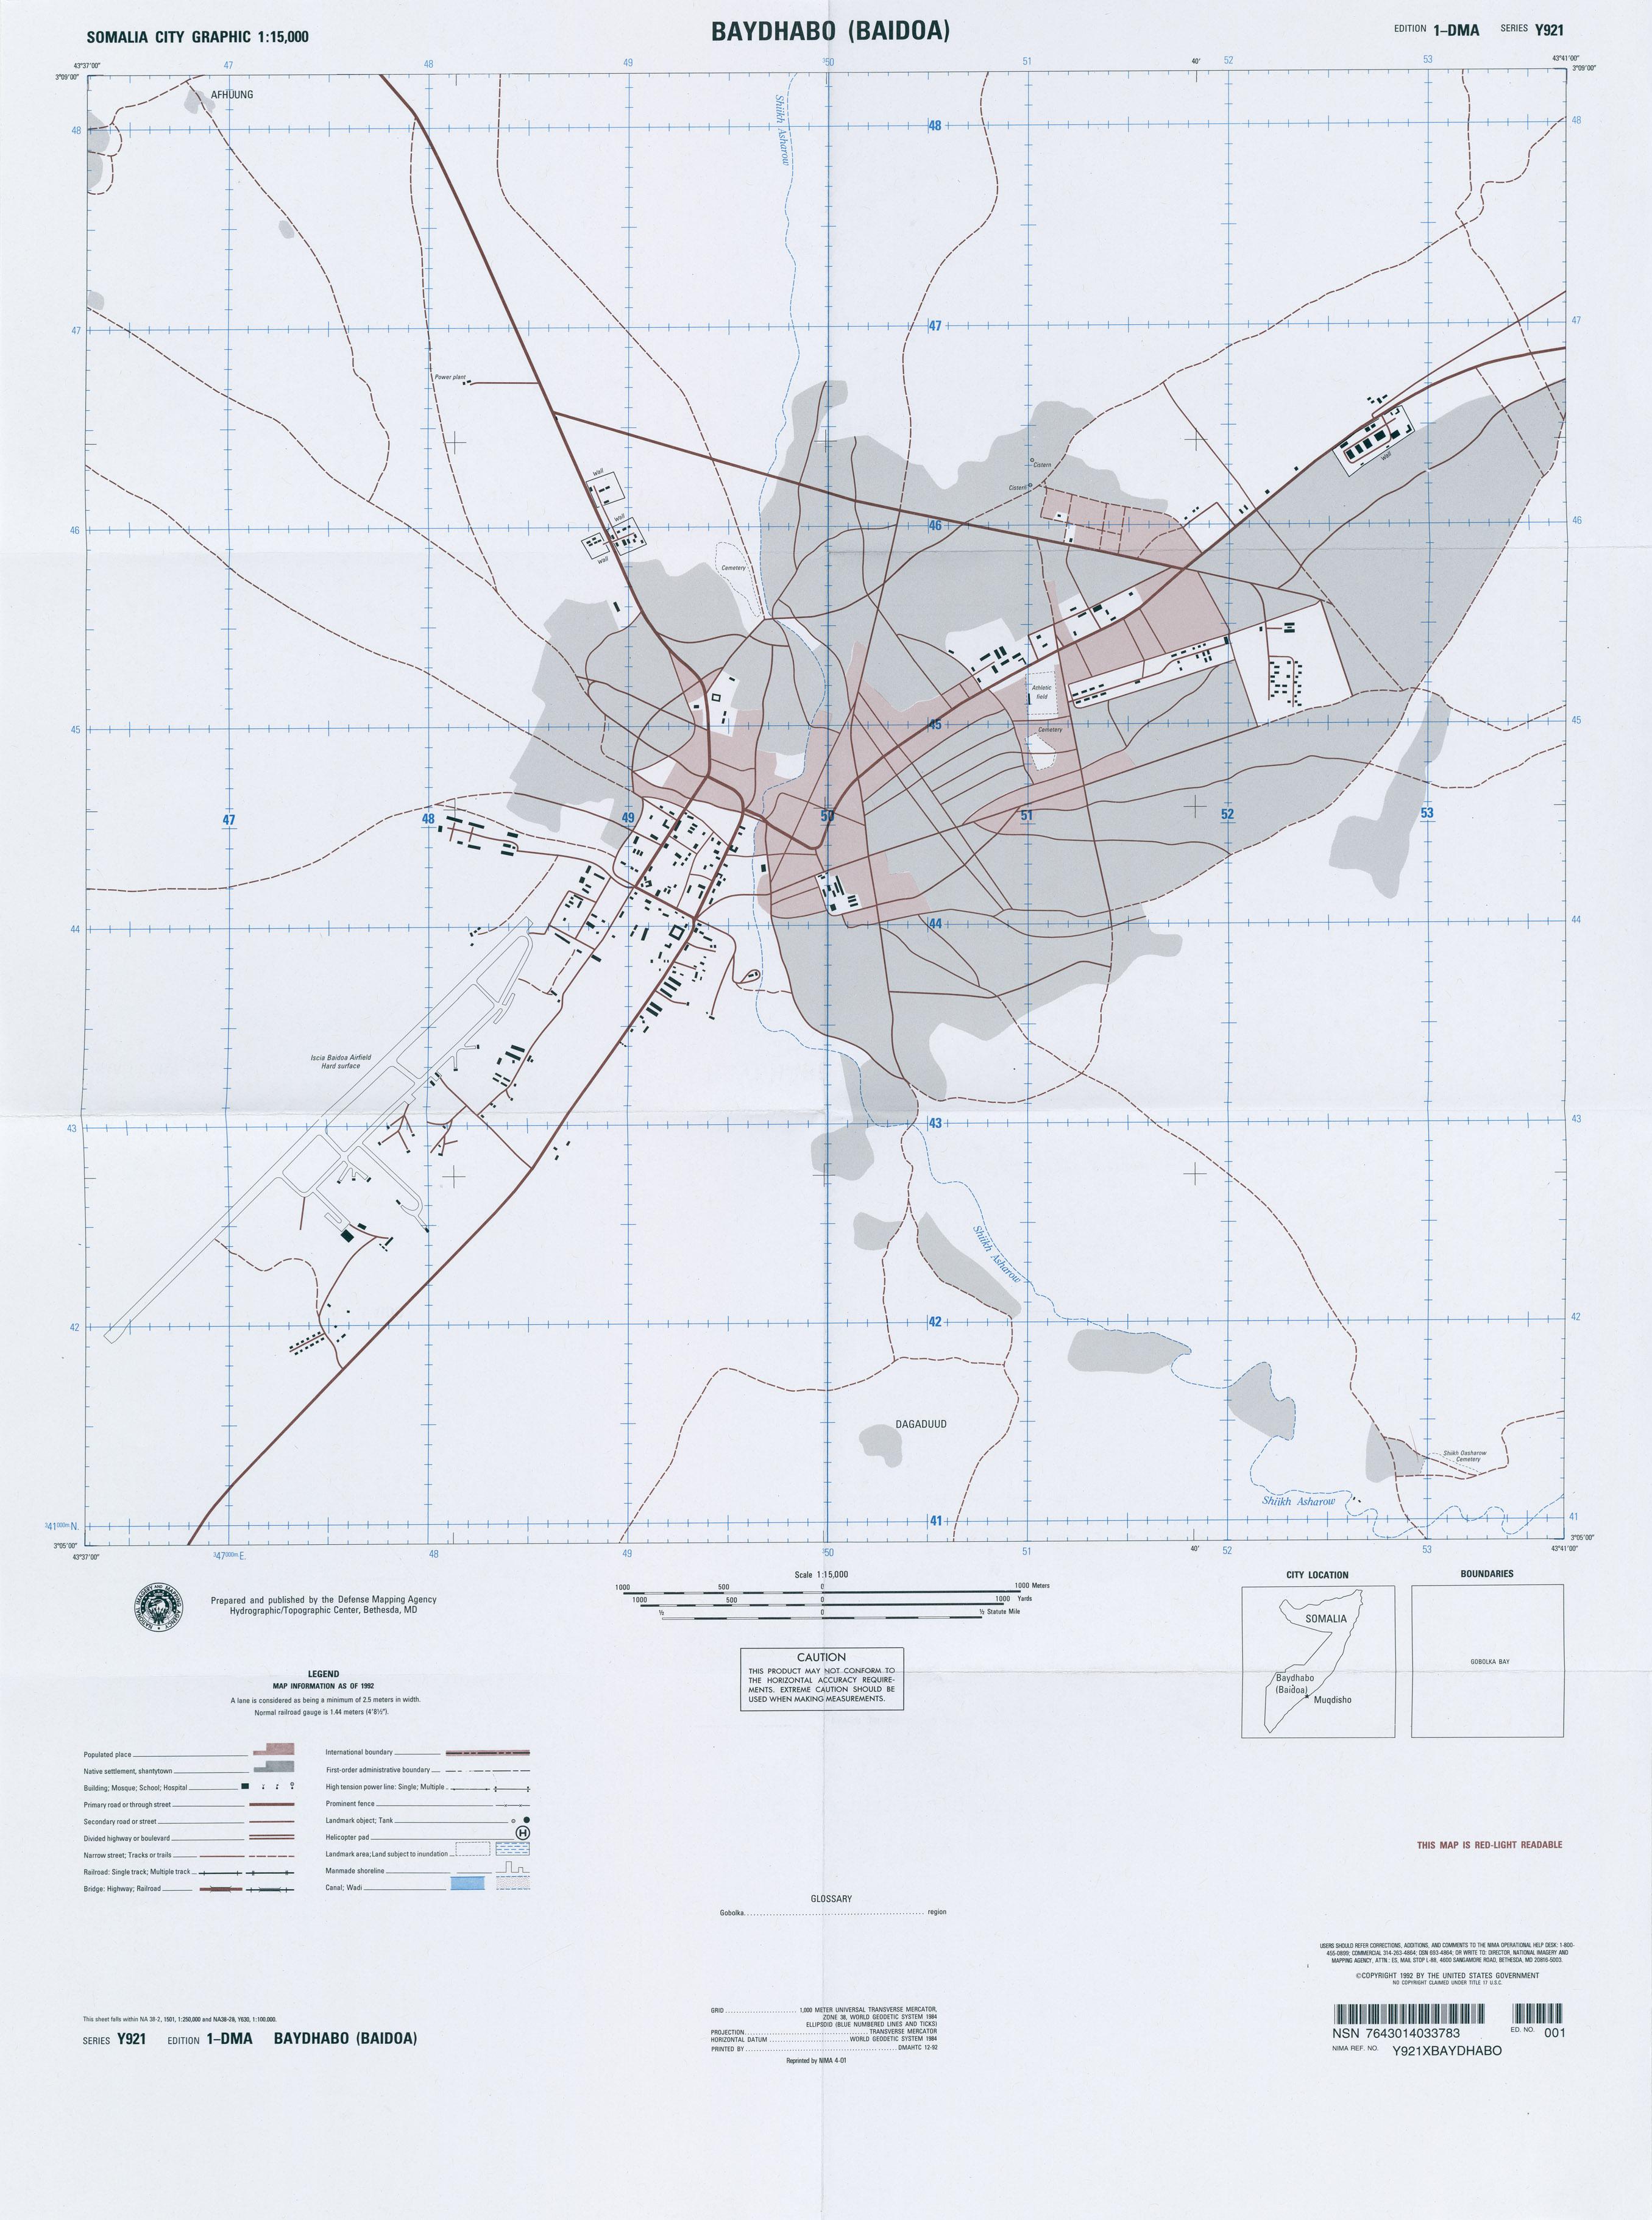 Mapa Topográfico de Baidoa (Baydhabo), Somalia